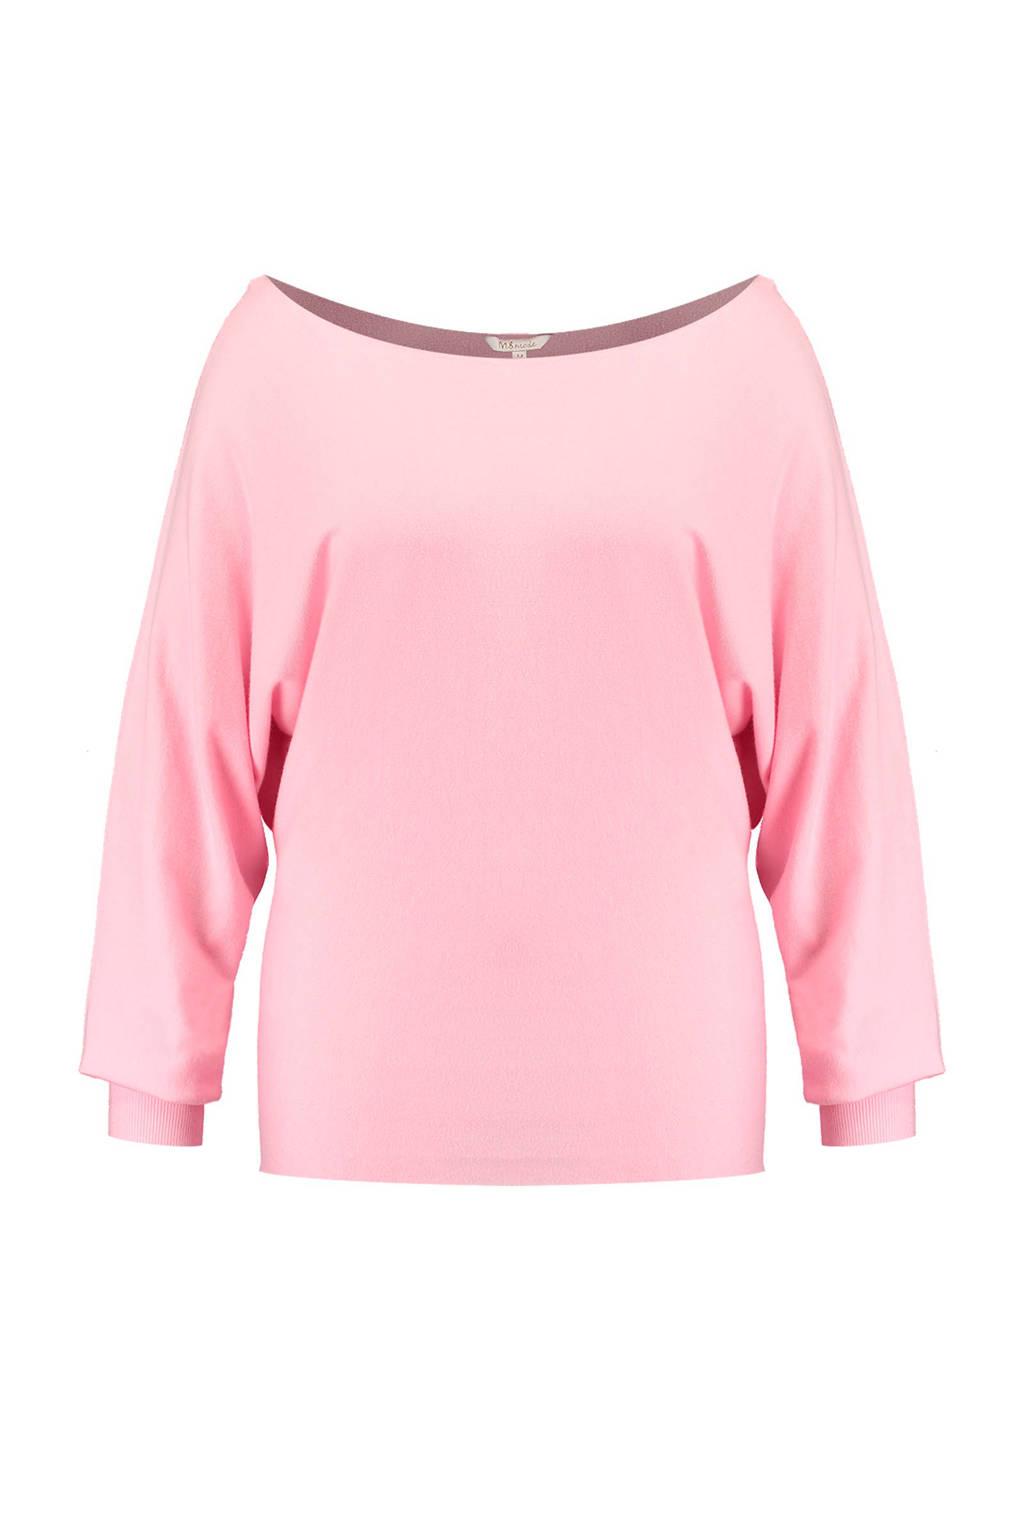 MS Mode trui roze, Roze